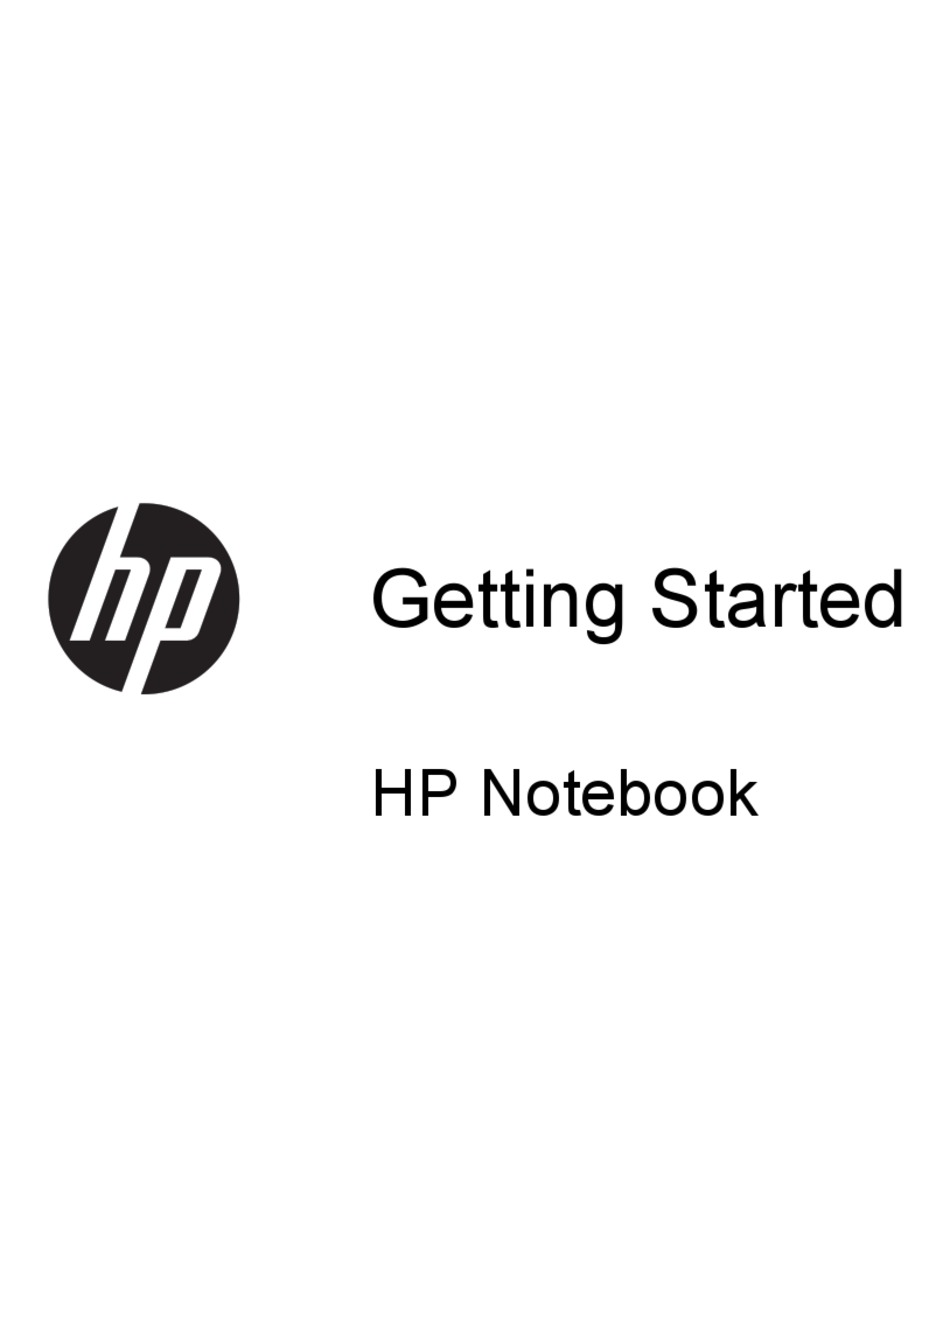 HP ELITEBOOK 8770W GETTING STARTED MANUAL Pdf Download